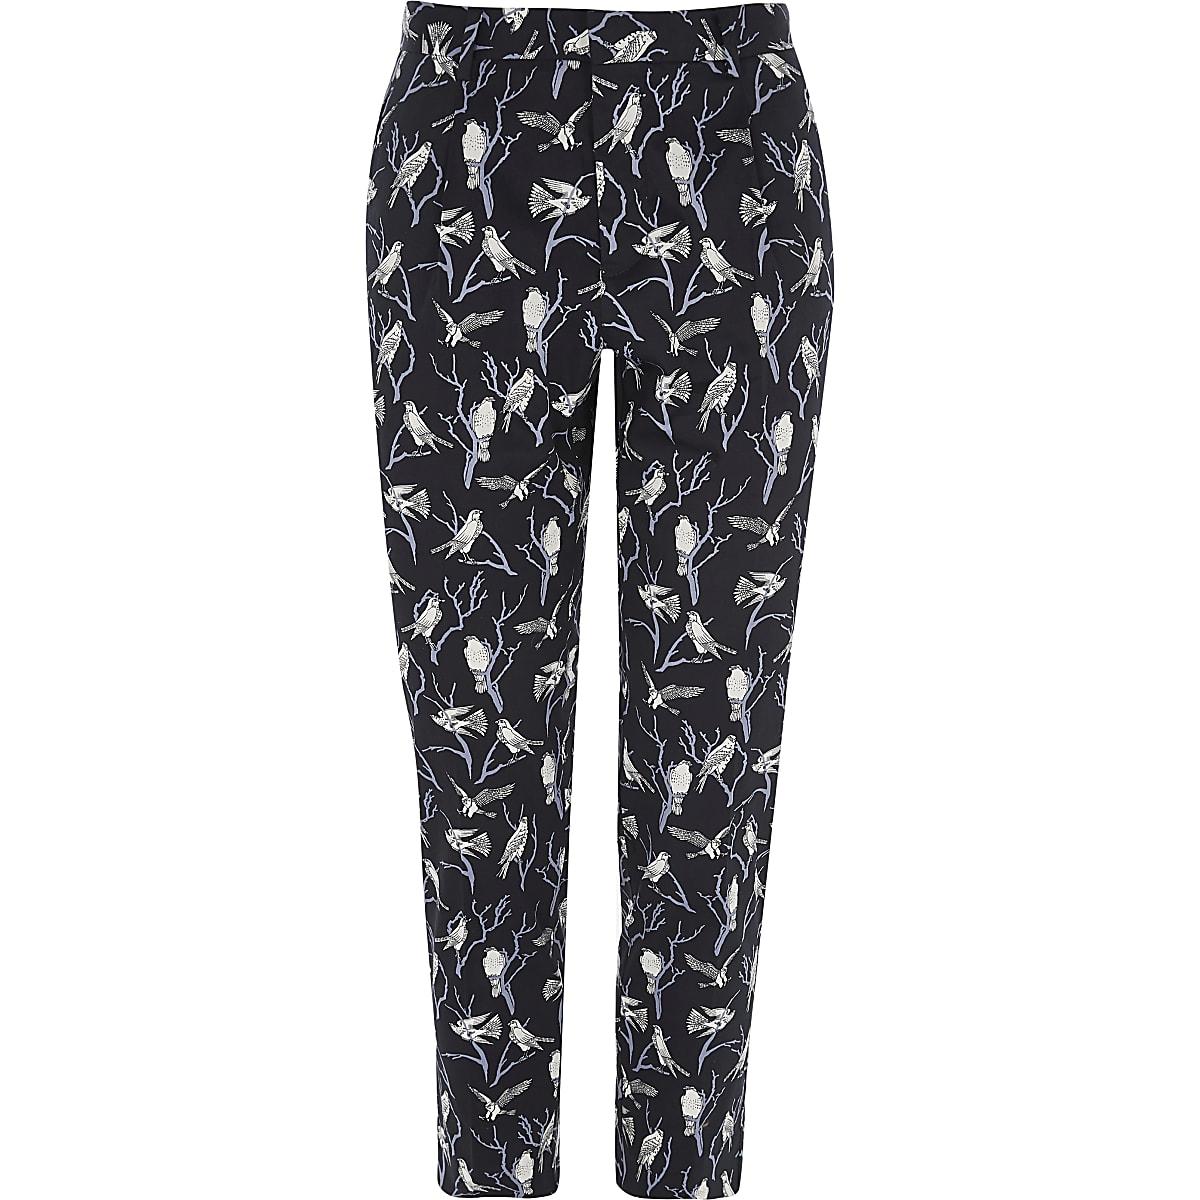 Jack & Jones Premium navy bird print trousers